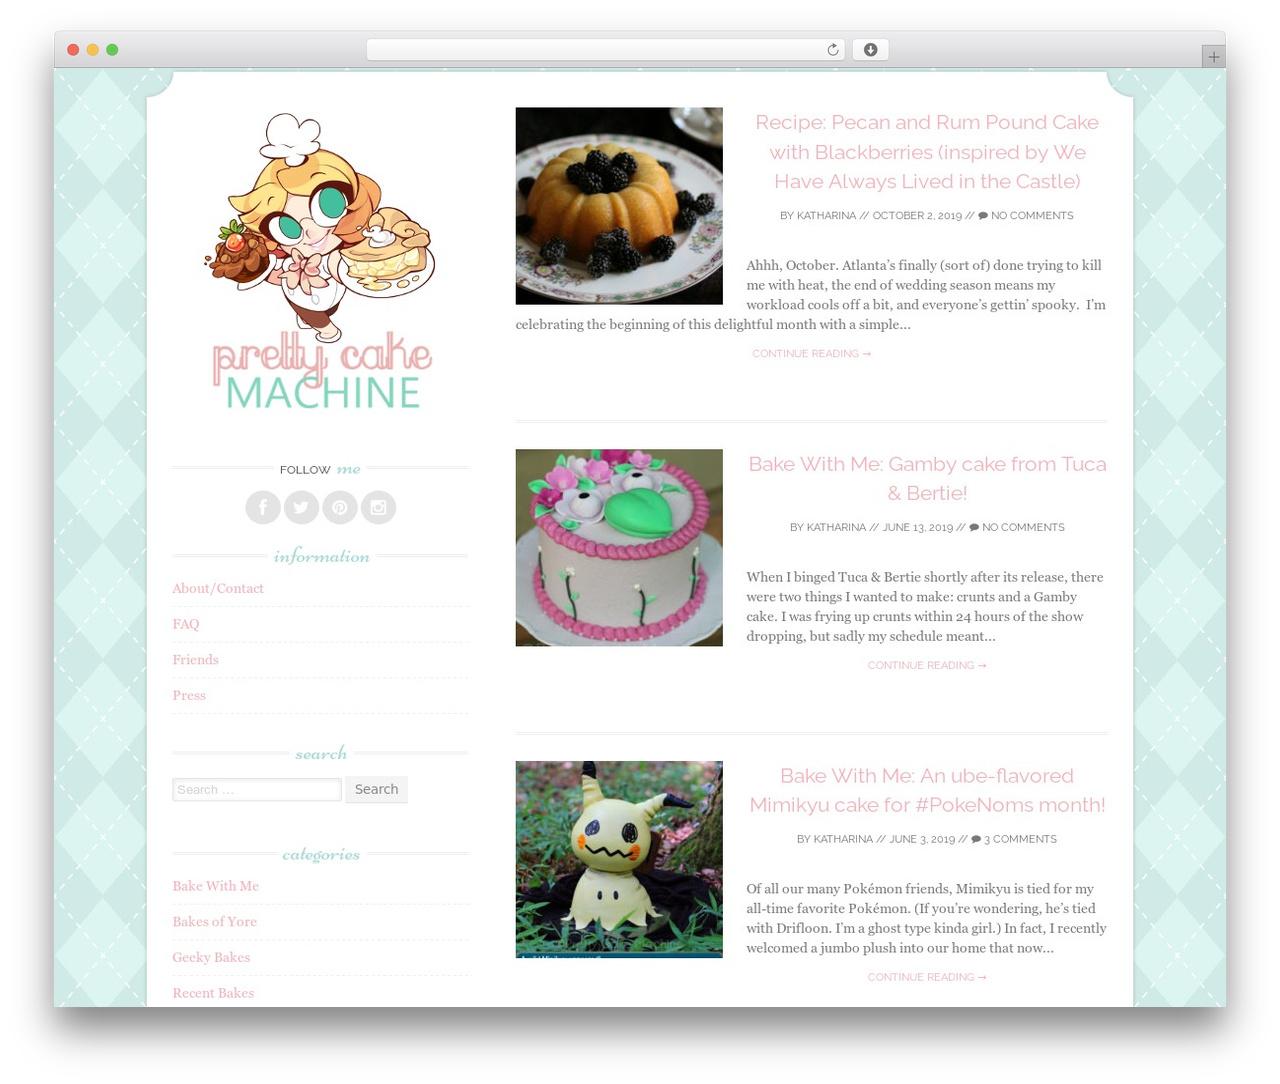 Sugar and Spice WordPress blog template - prettycakemachine.com